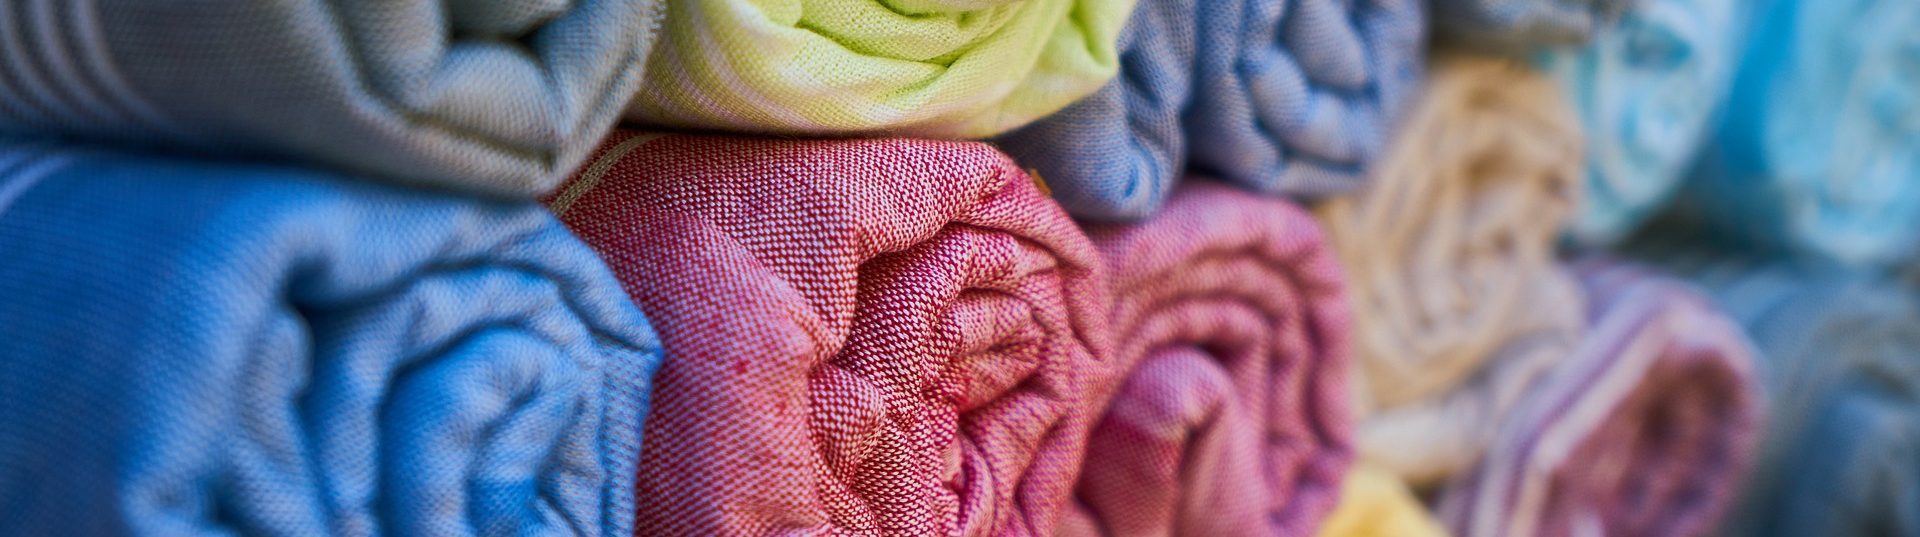 Noi's Story – Sensitivity to Clothing